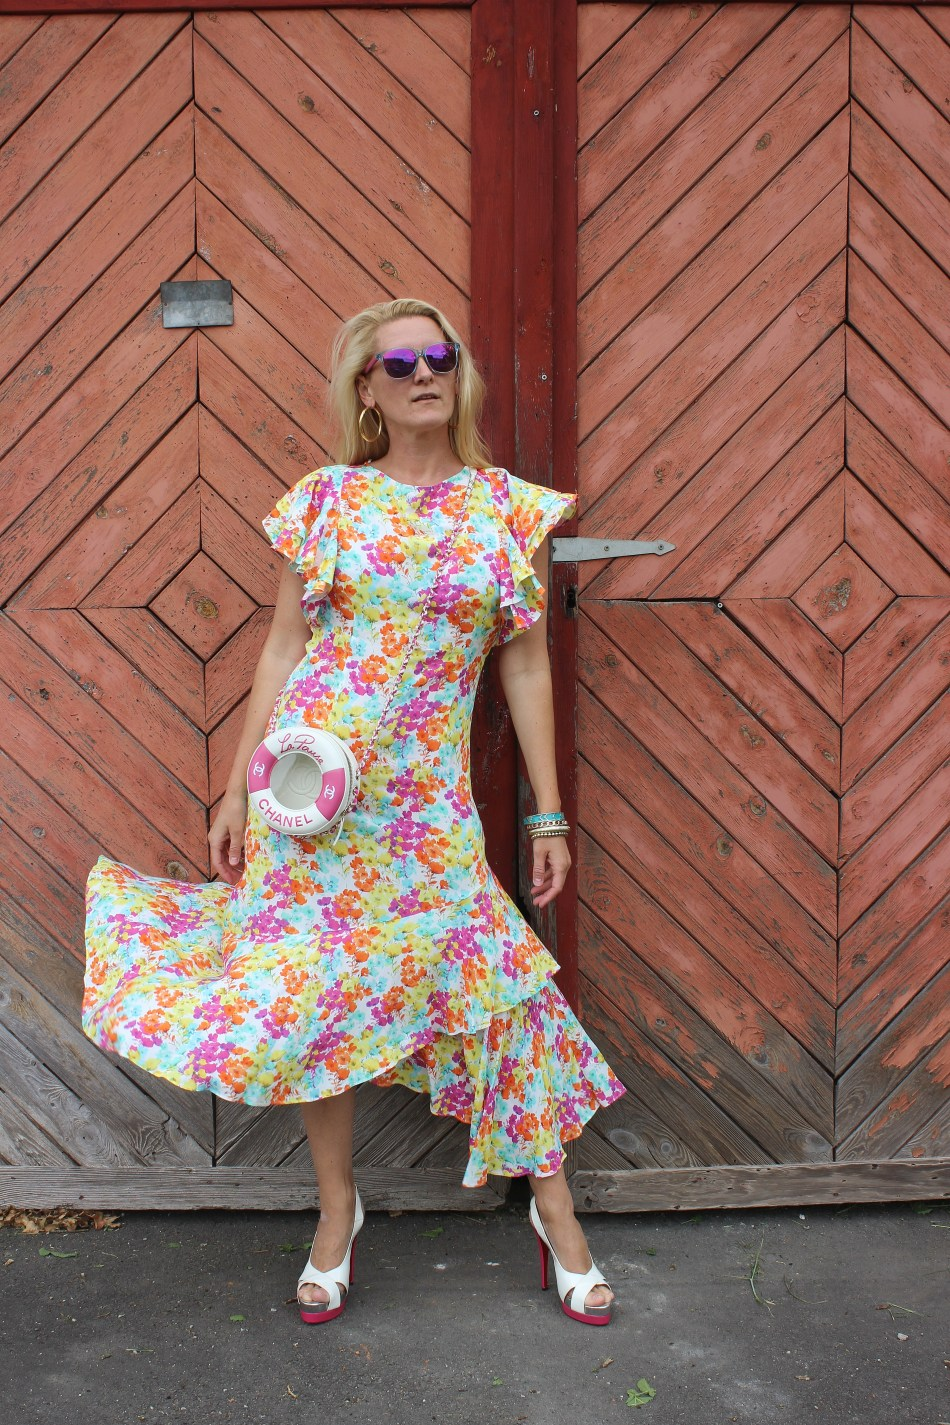 Emel Gloss-Sommerkollektion-Blumenprint Kleid-Christian Louboutin Heels-Chanel La Pausa Bag-Tasche-carrieslifestyle-Tamara-Prutsch-Bloggerstyle